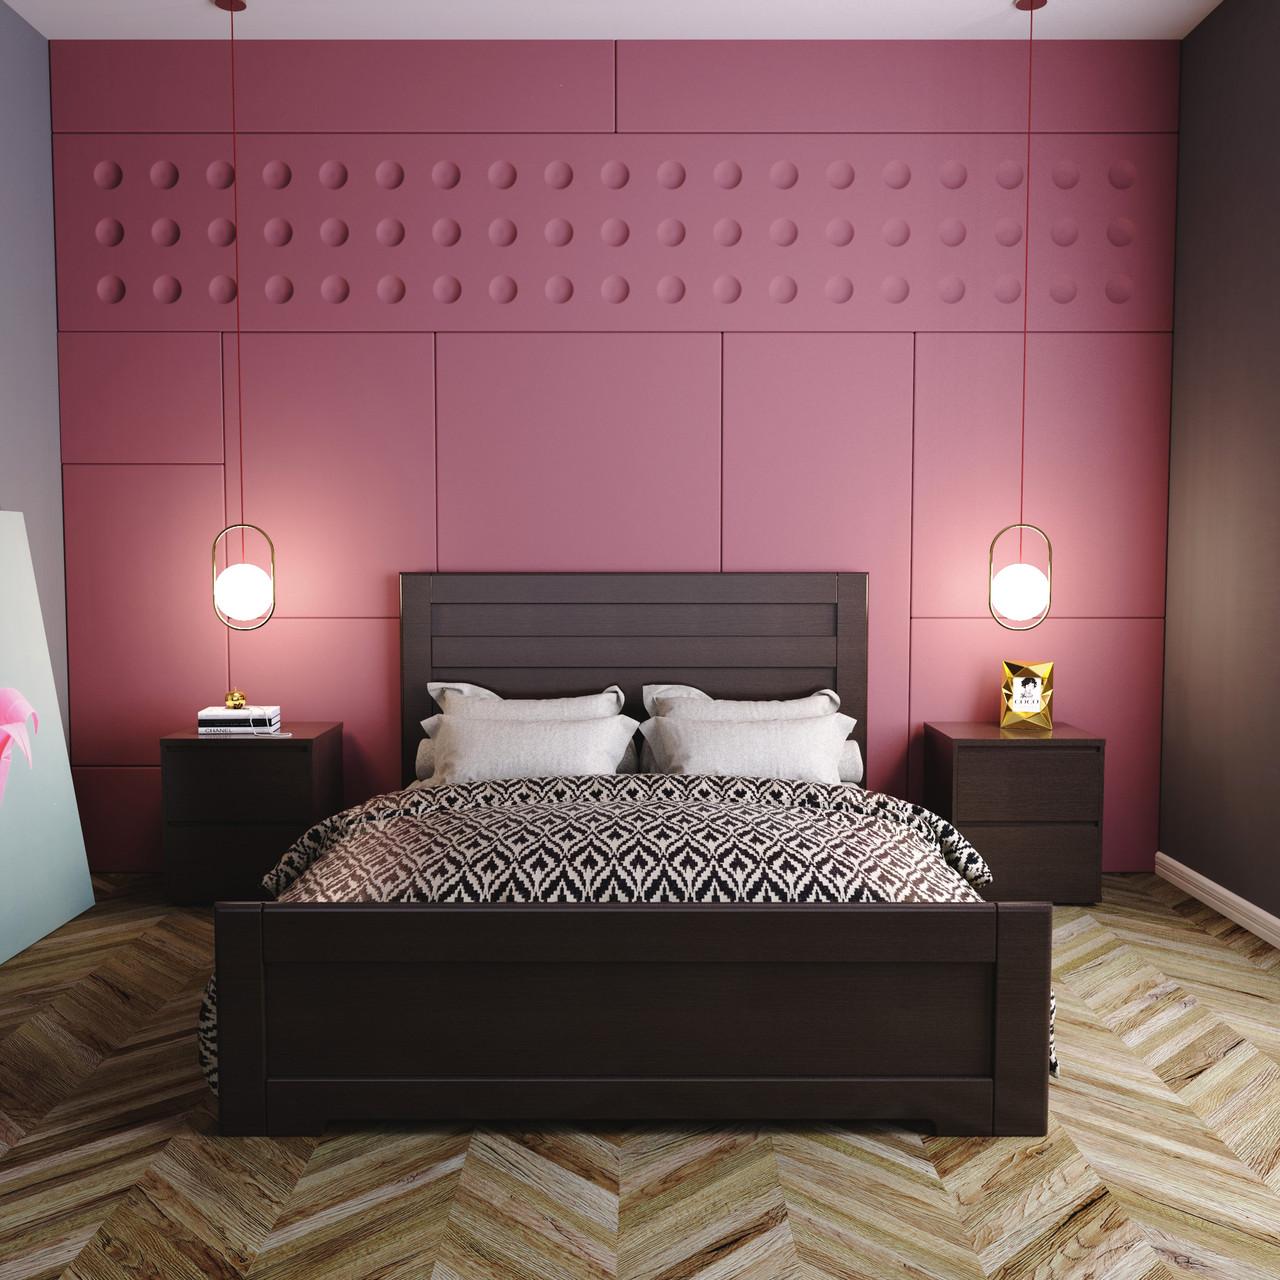 Ліжко Light Венге (1670, 1600x2000)